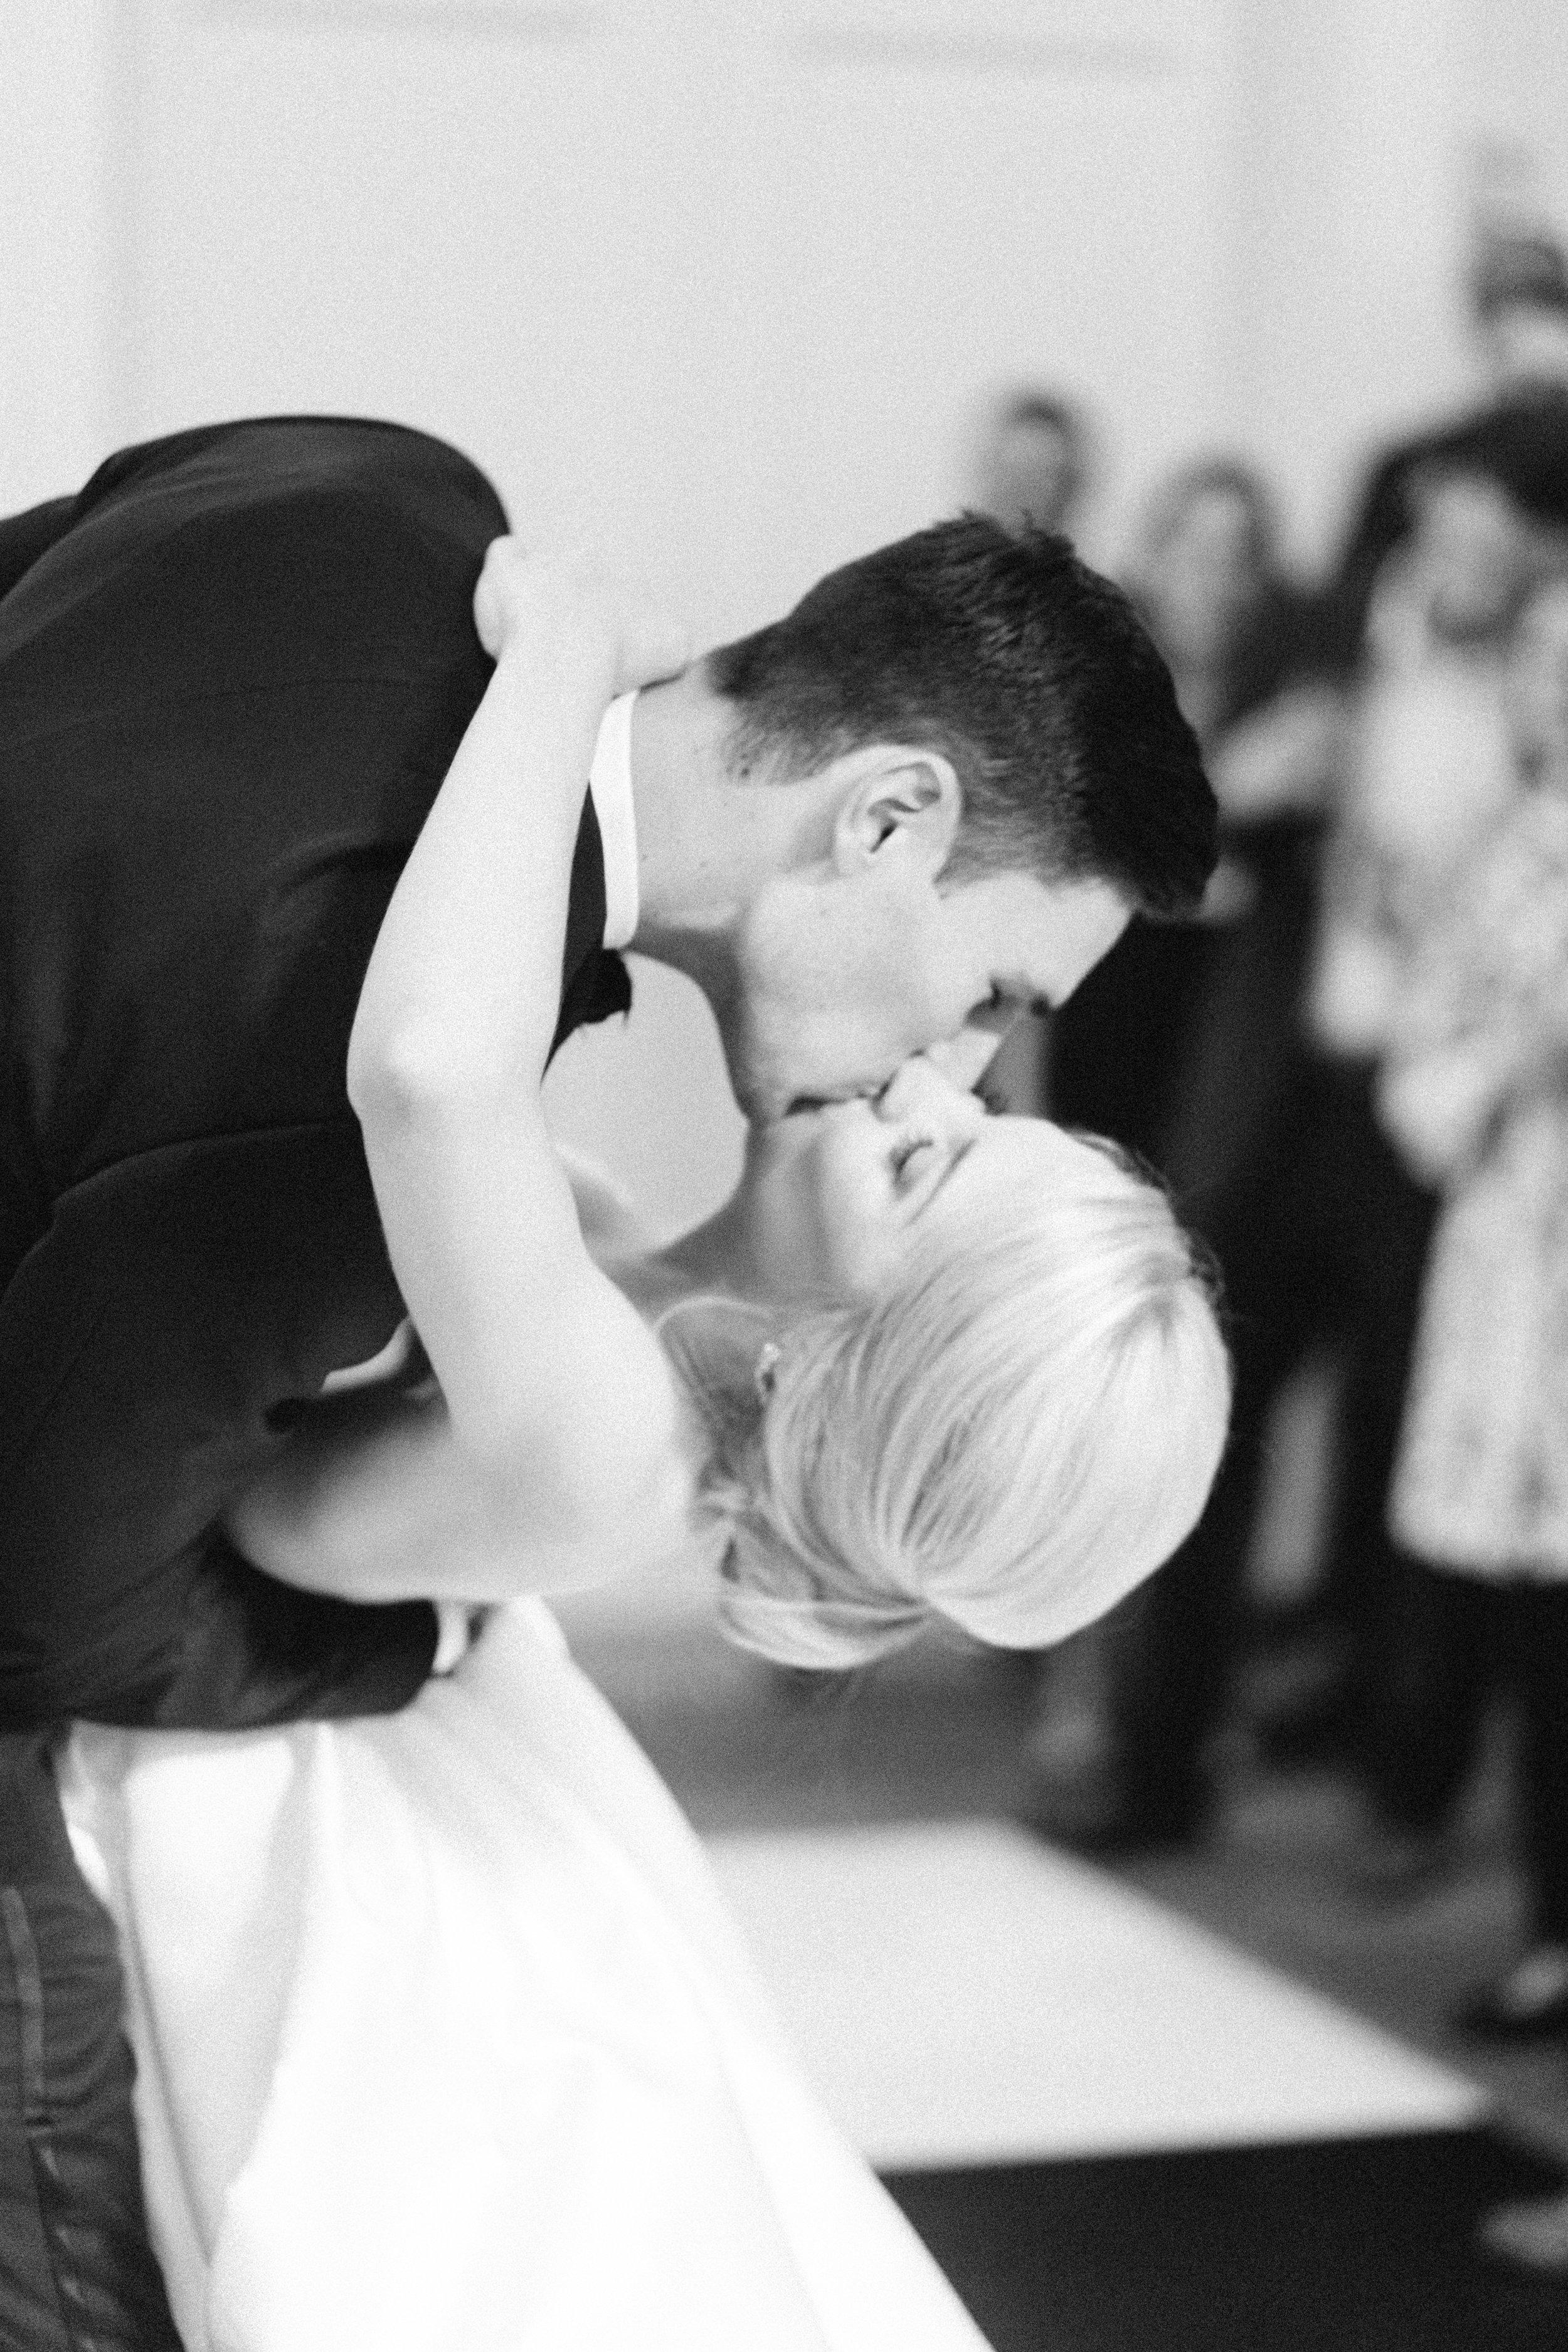 Marie_Perry_Duke_Mansion_Wedding_Charlotte_NC_Abigail_Malone_Photography-622.jpg